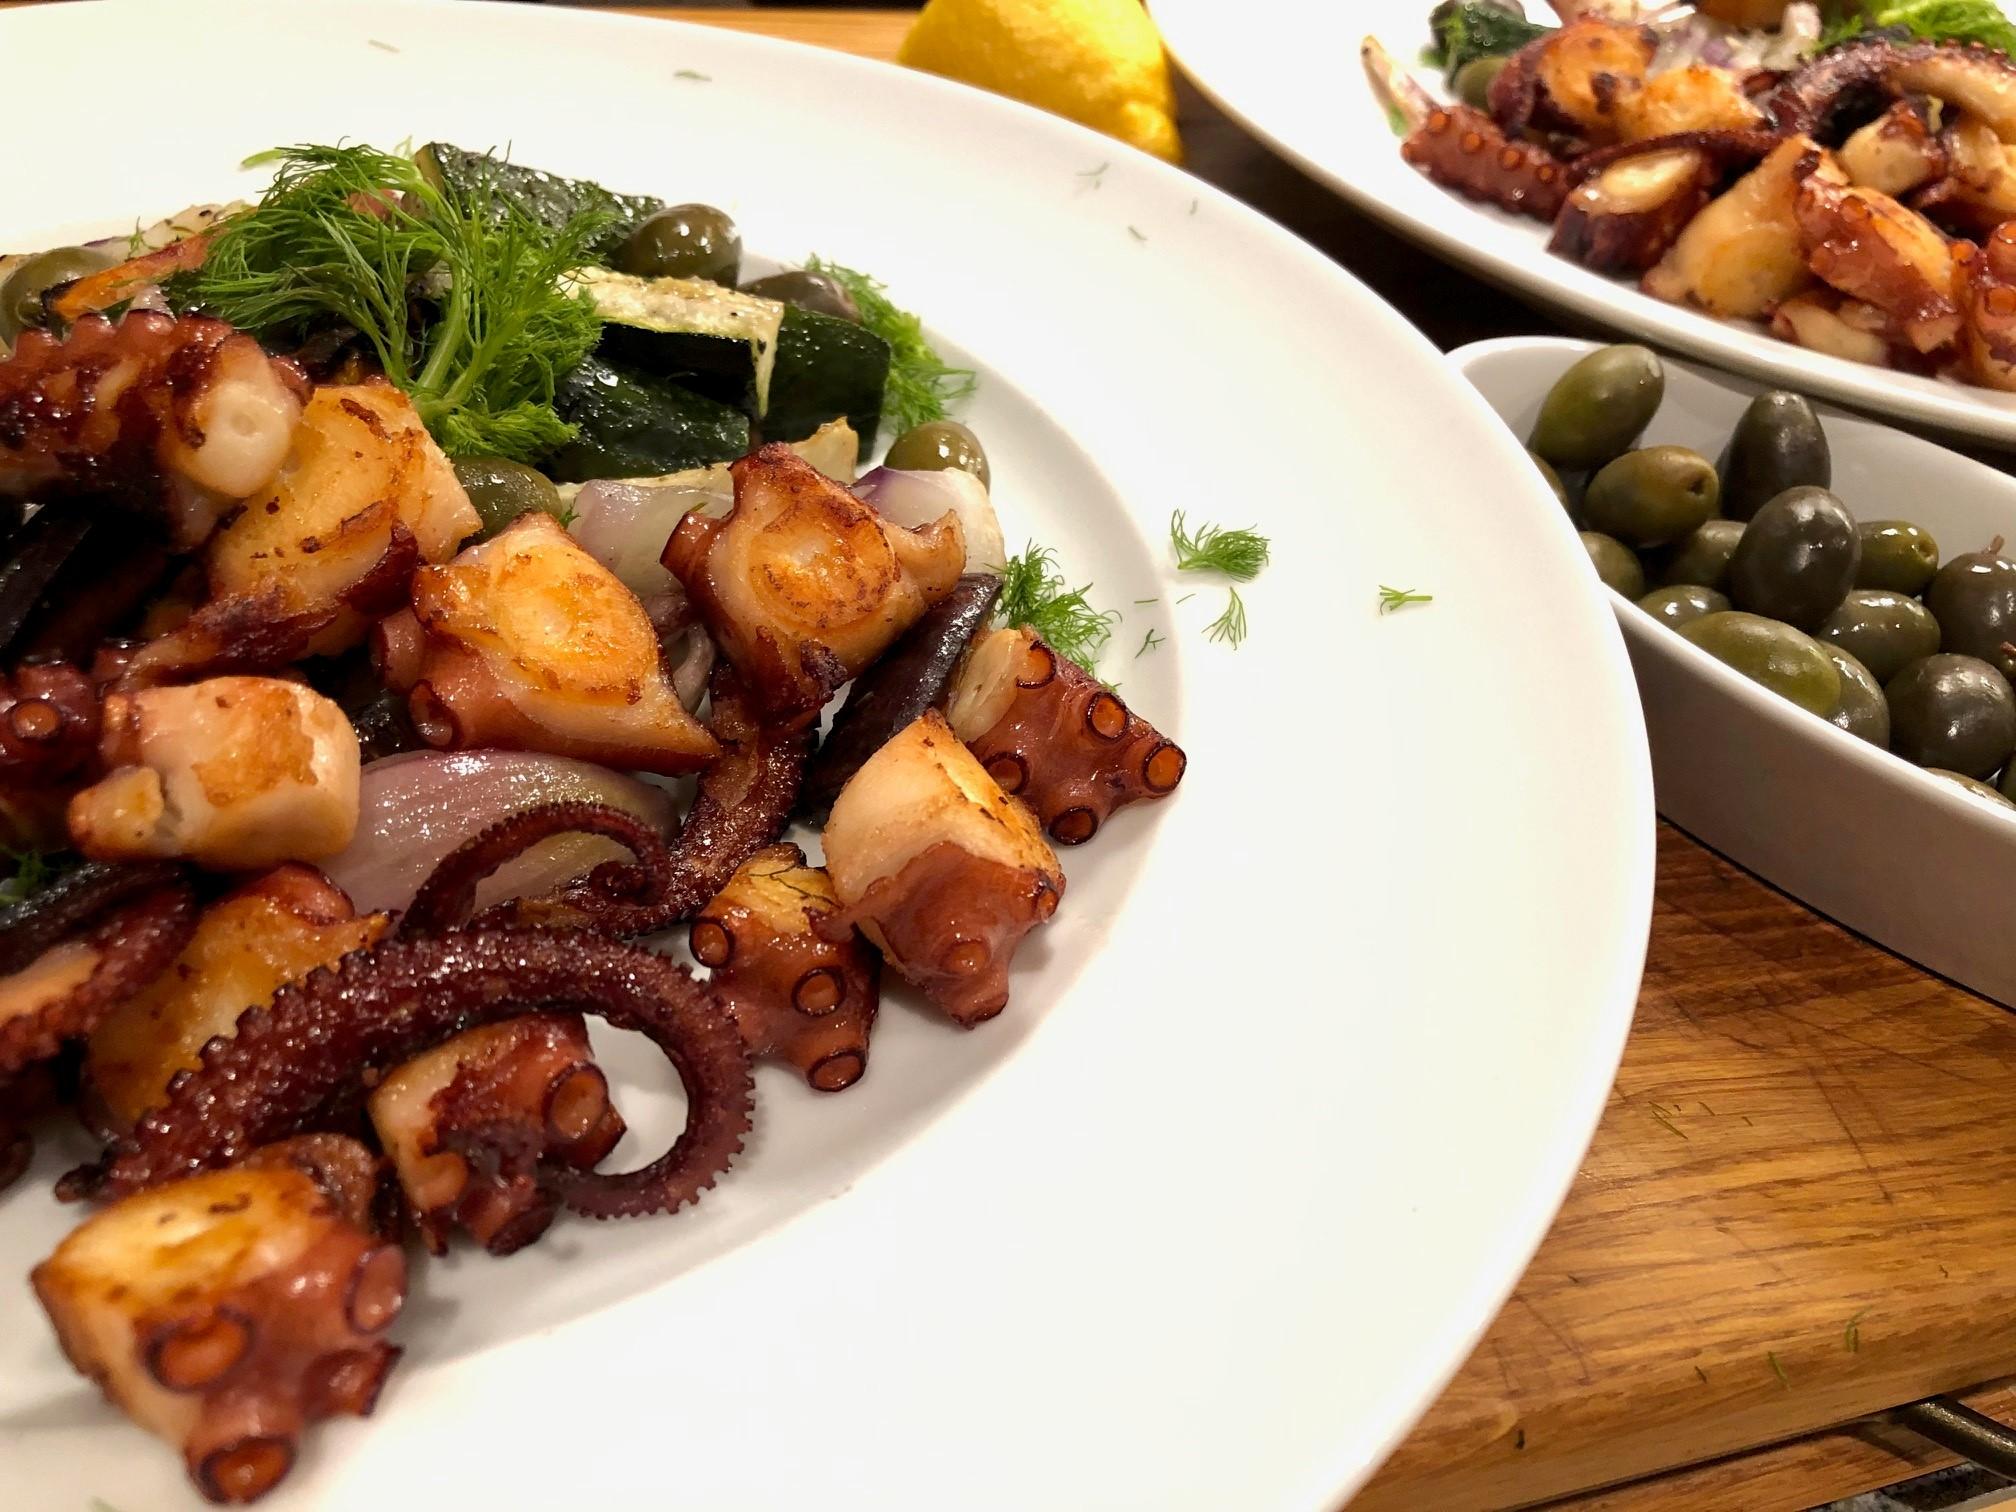 Knuspriger Oktopus mit mediterranem Ofengemüse